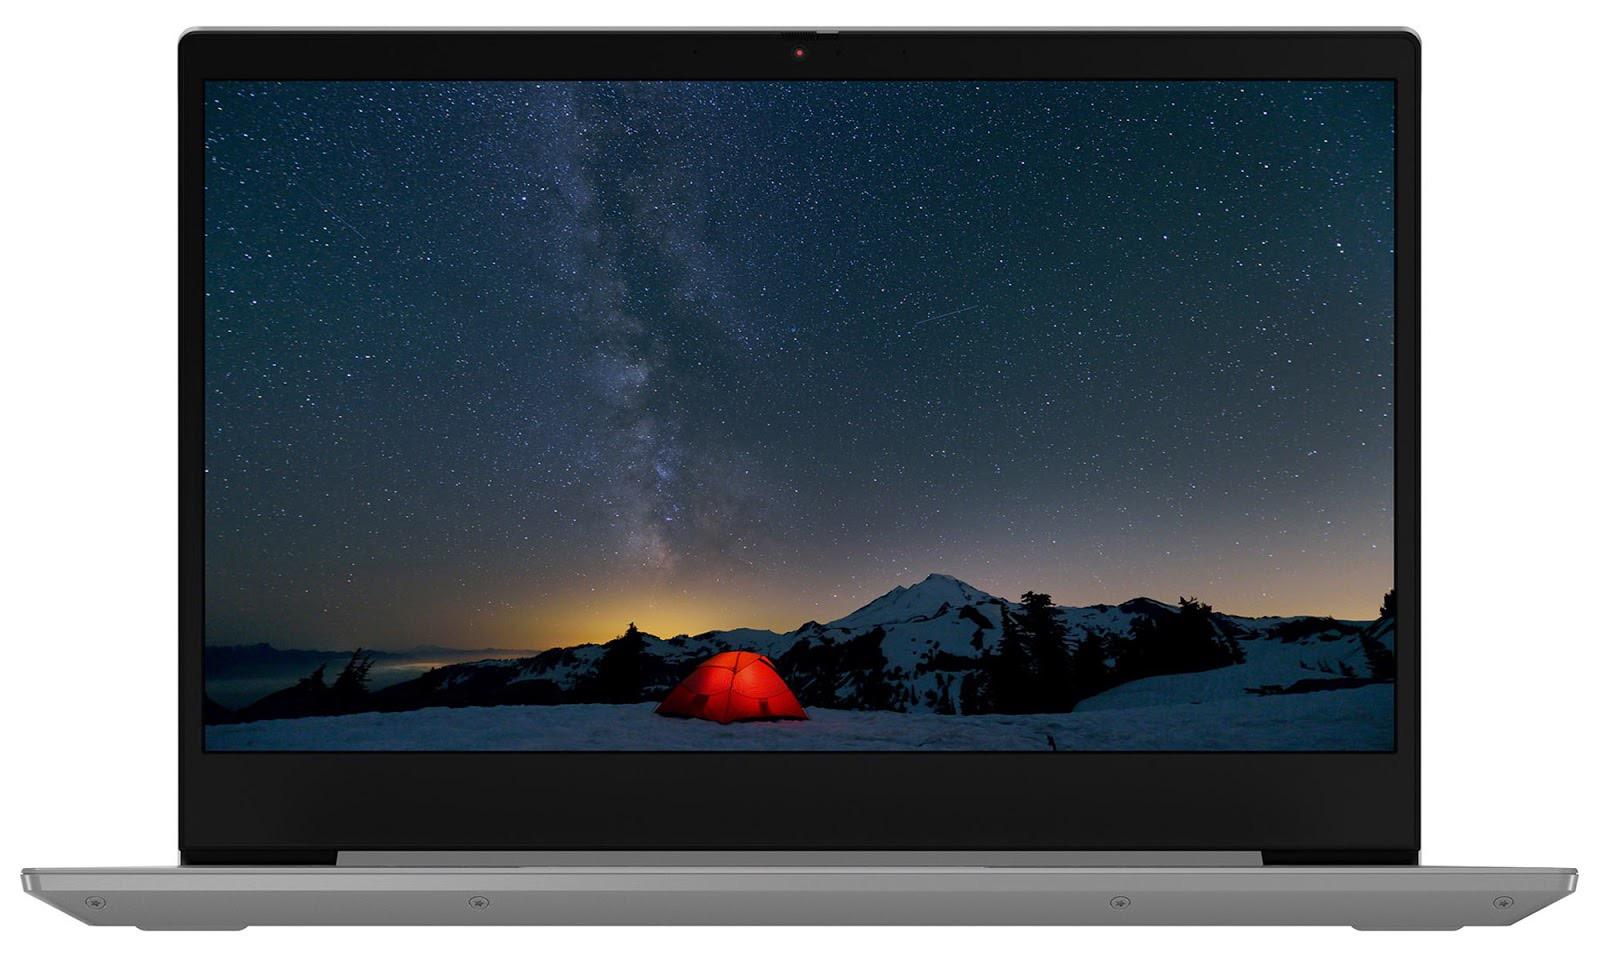 Фото 1. Ноутбук Lenovo ThinkBook 14 IIL (20SL00P1RU)